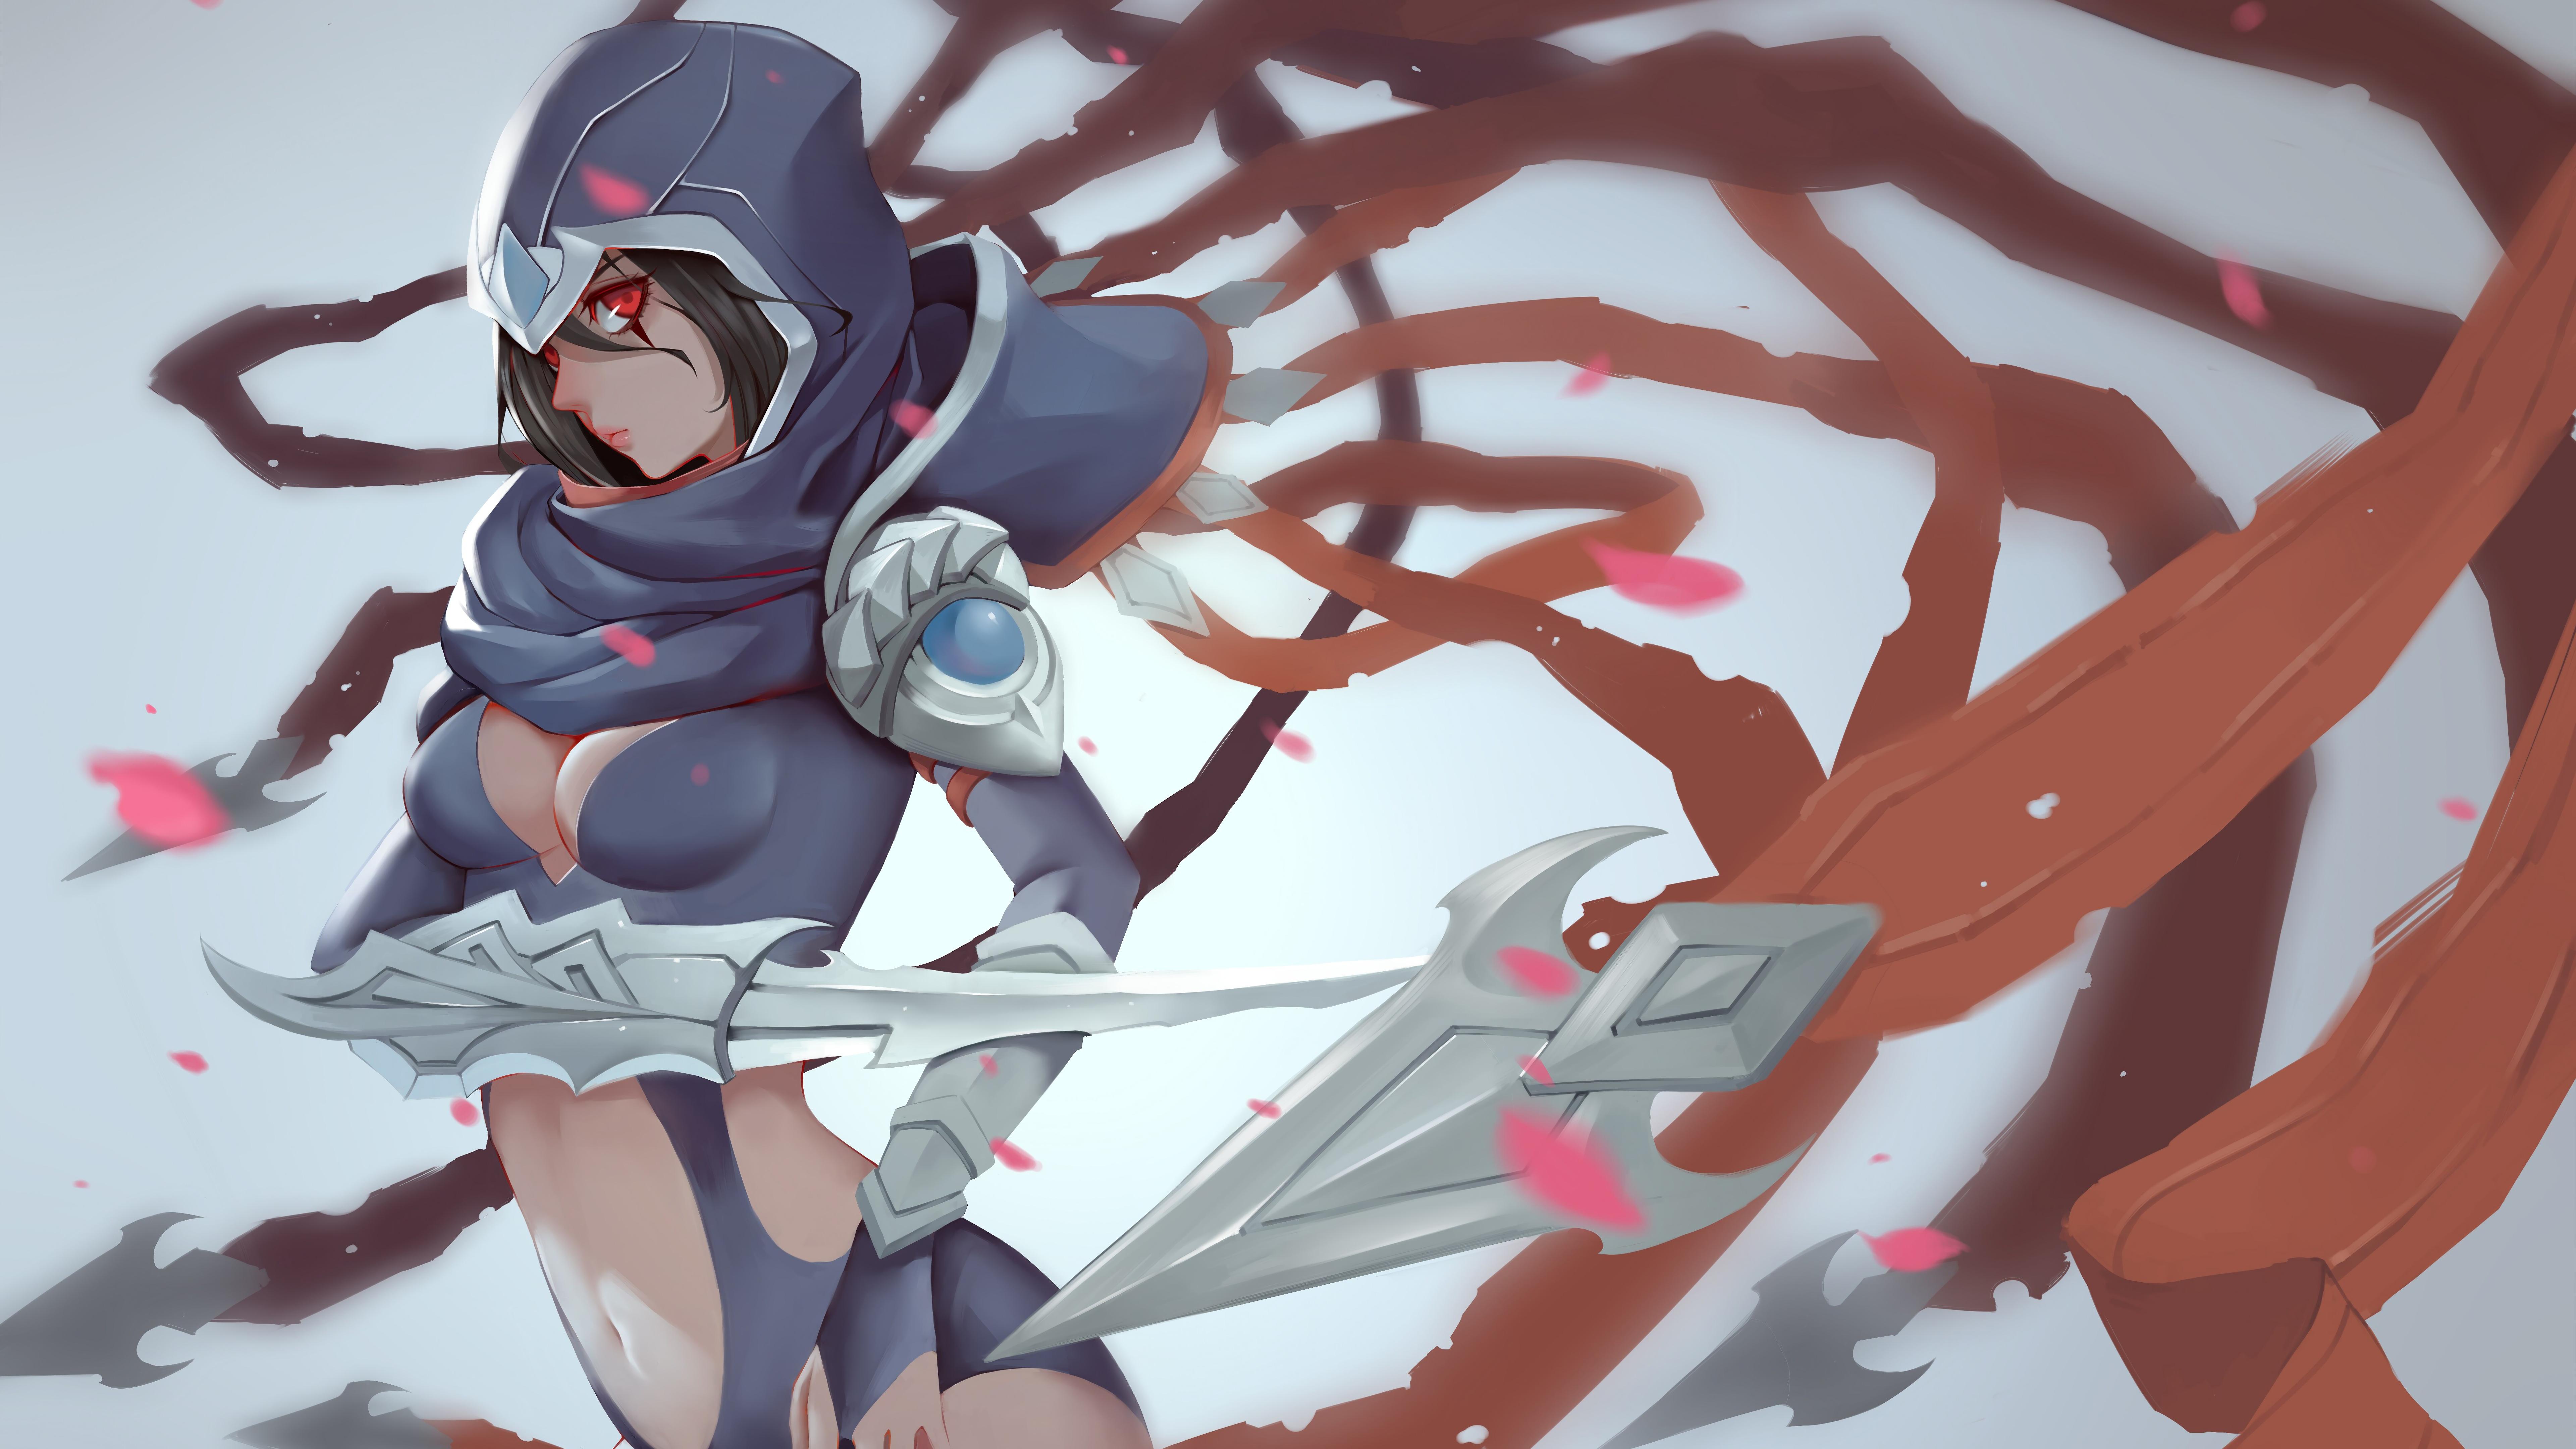 Wallpaper 4k Female Talon Lol League Of Legends League Of Legends